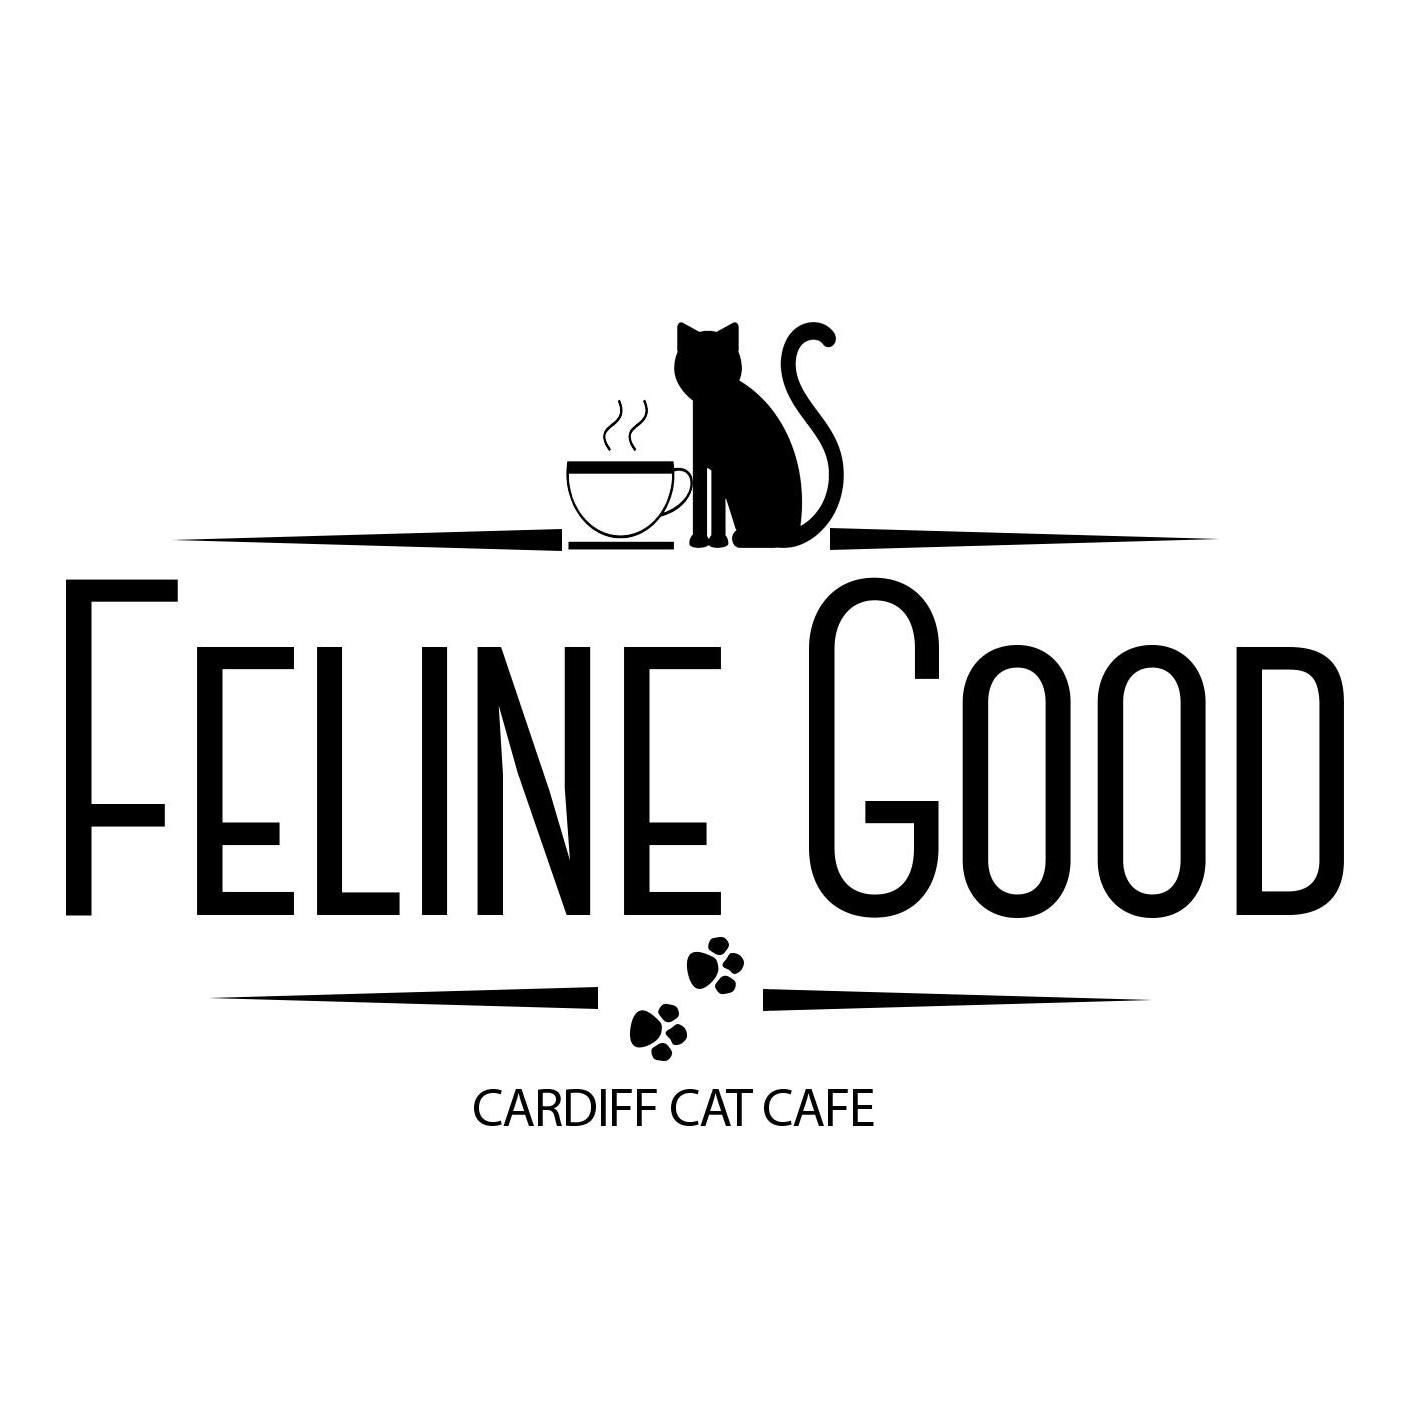 Feline good cat cafe logo